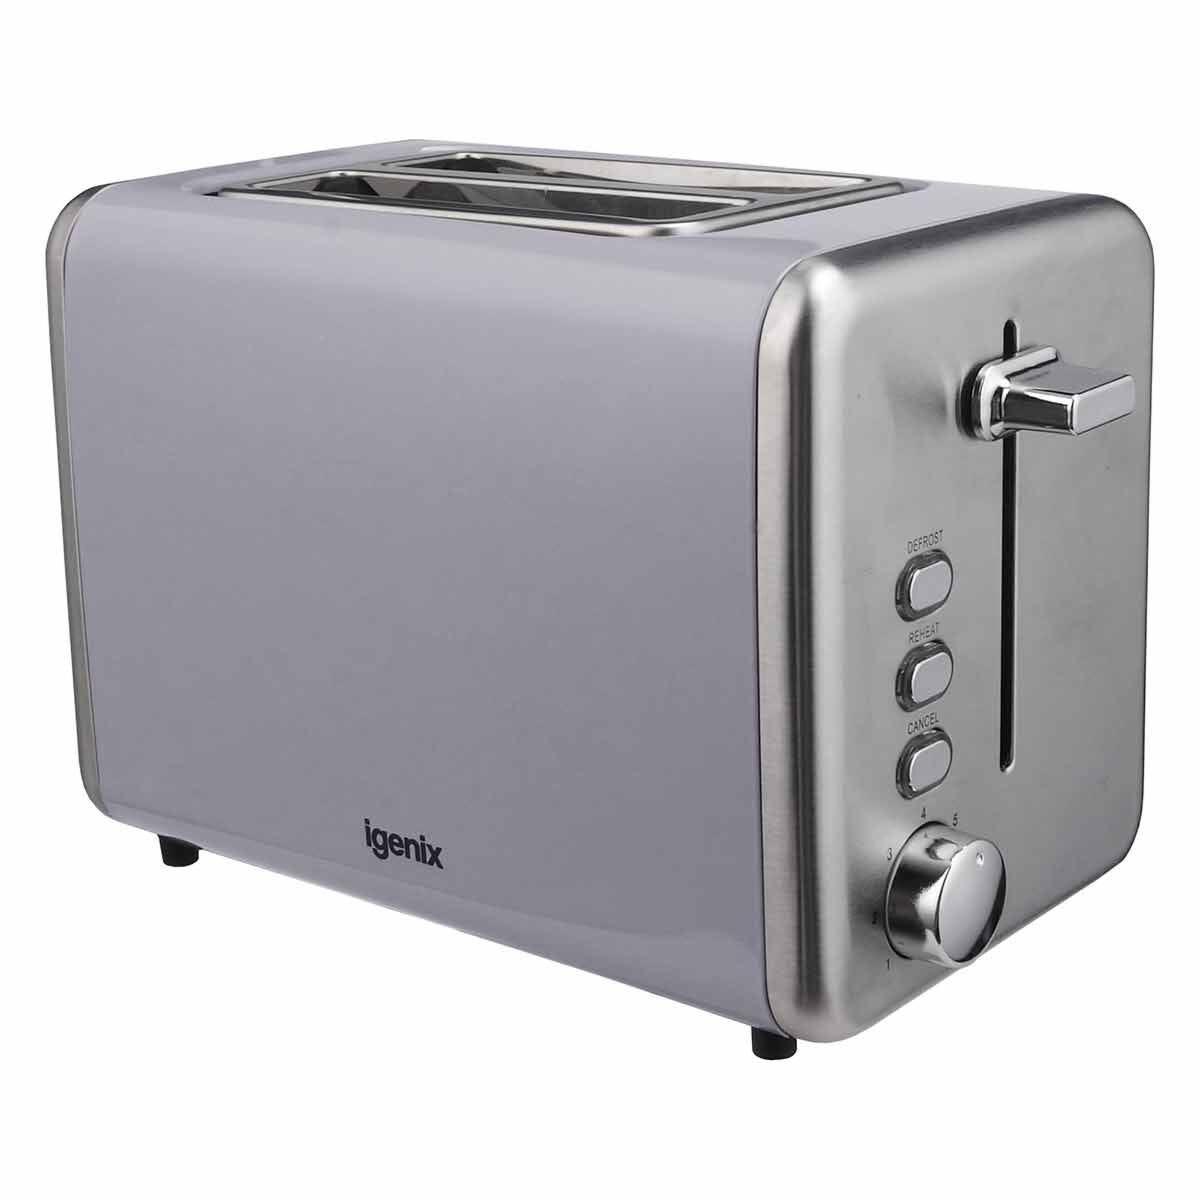 Igenix 2 Slice Toaster with Stainless Steel Grey